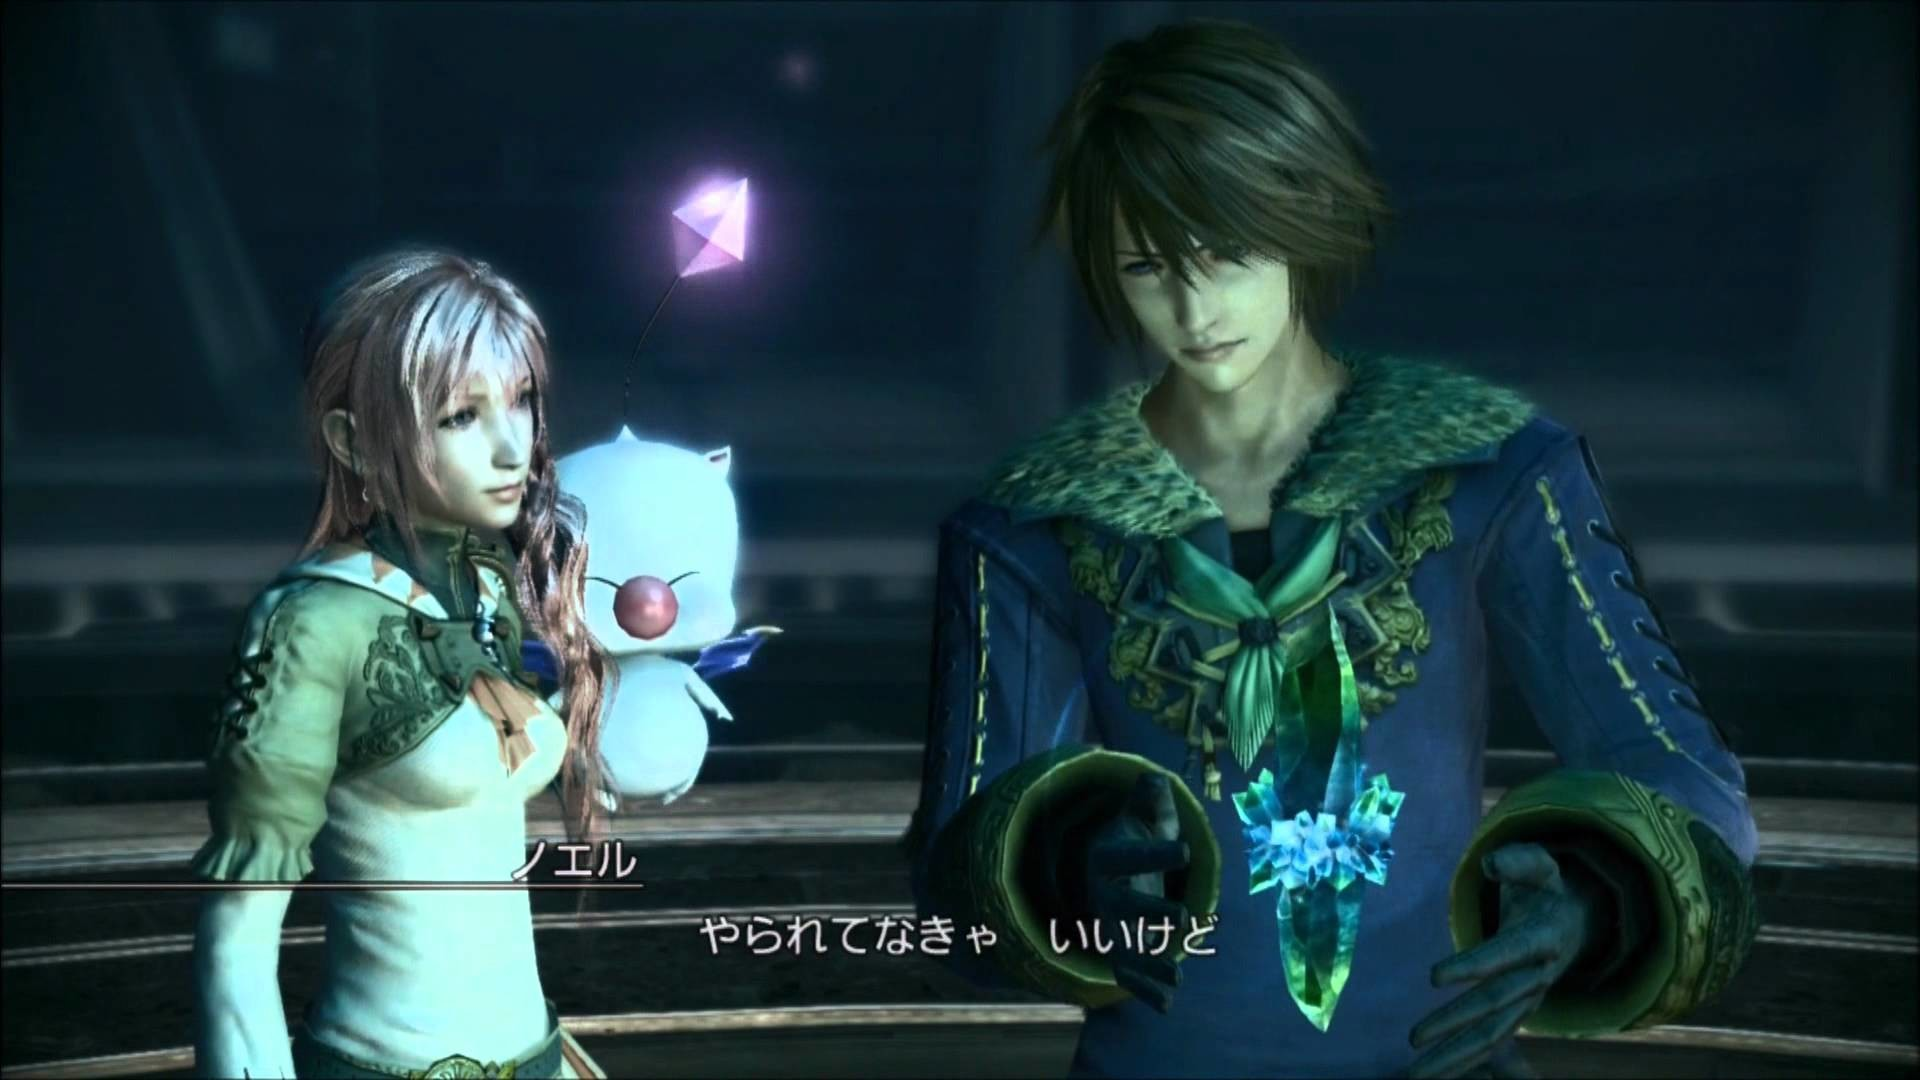 Final Fantasy XIII-2 – DLC No.12 Costumes (White Mage Attire & Black Mage  Attire Outfit)